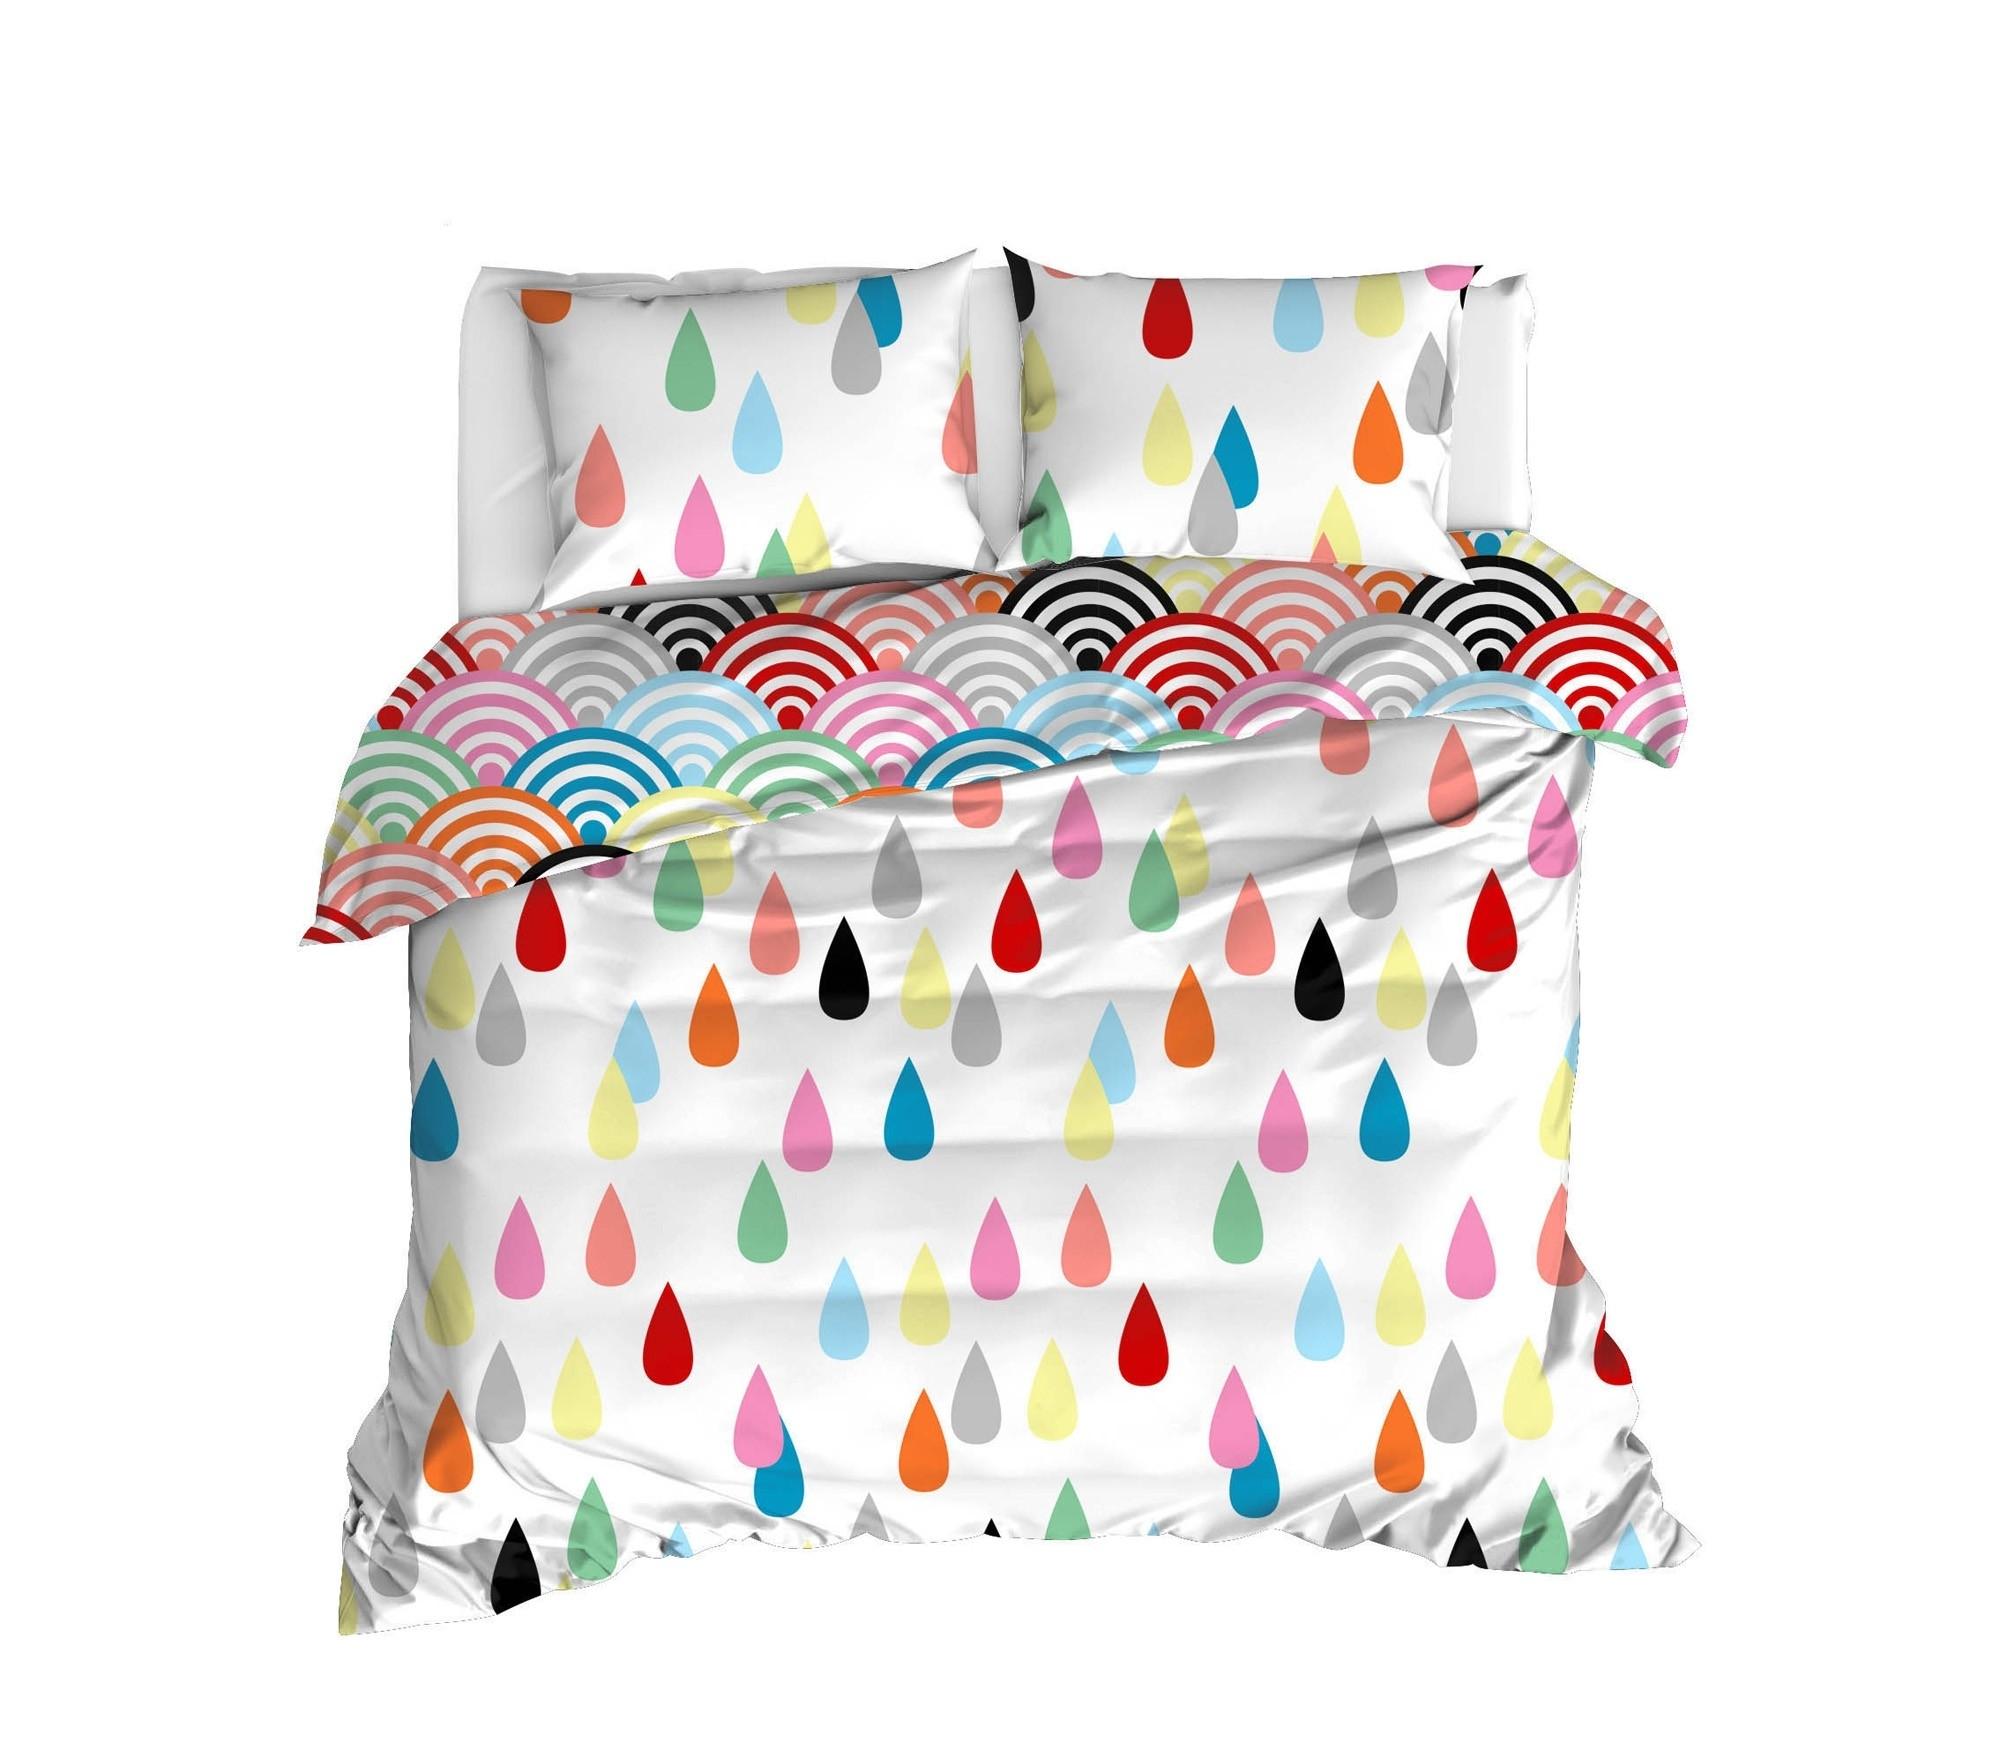 Lenjerie de pat din bumbac Ranforce Vendula Multicolor, 200 x 220 cm imagine